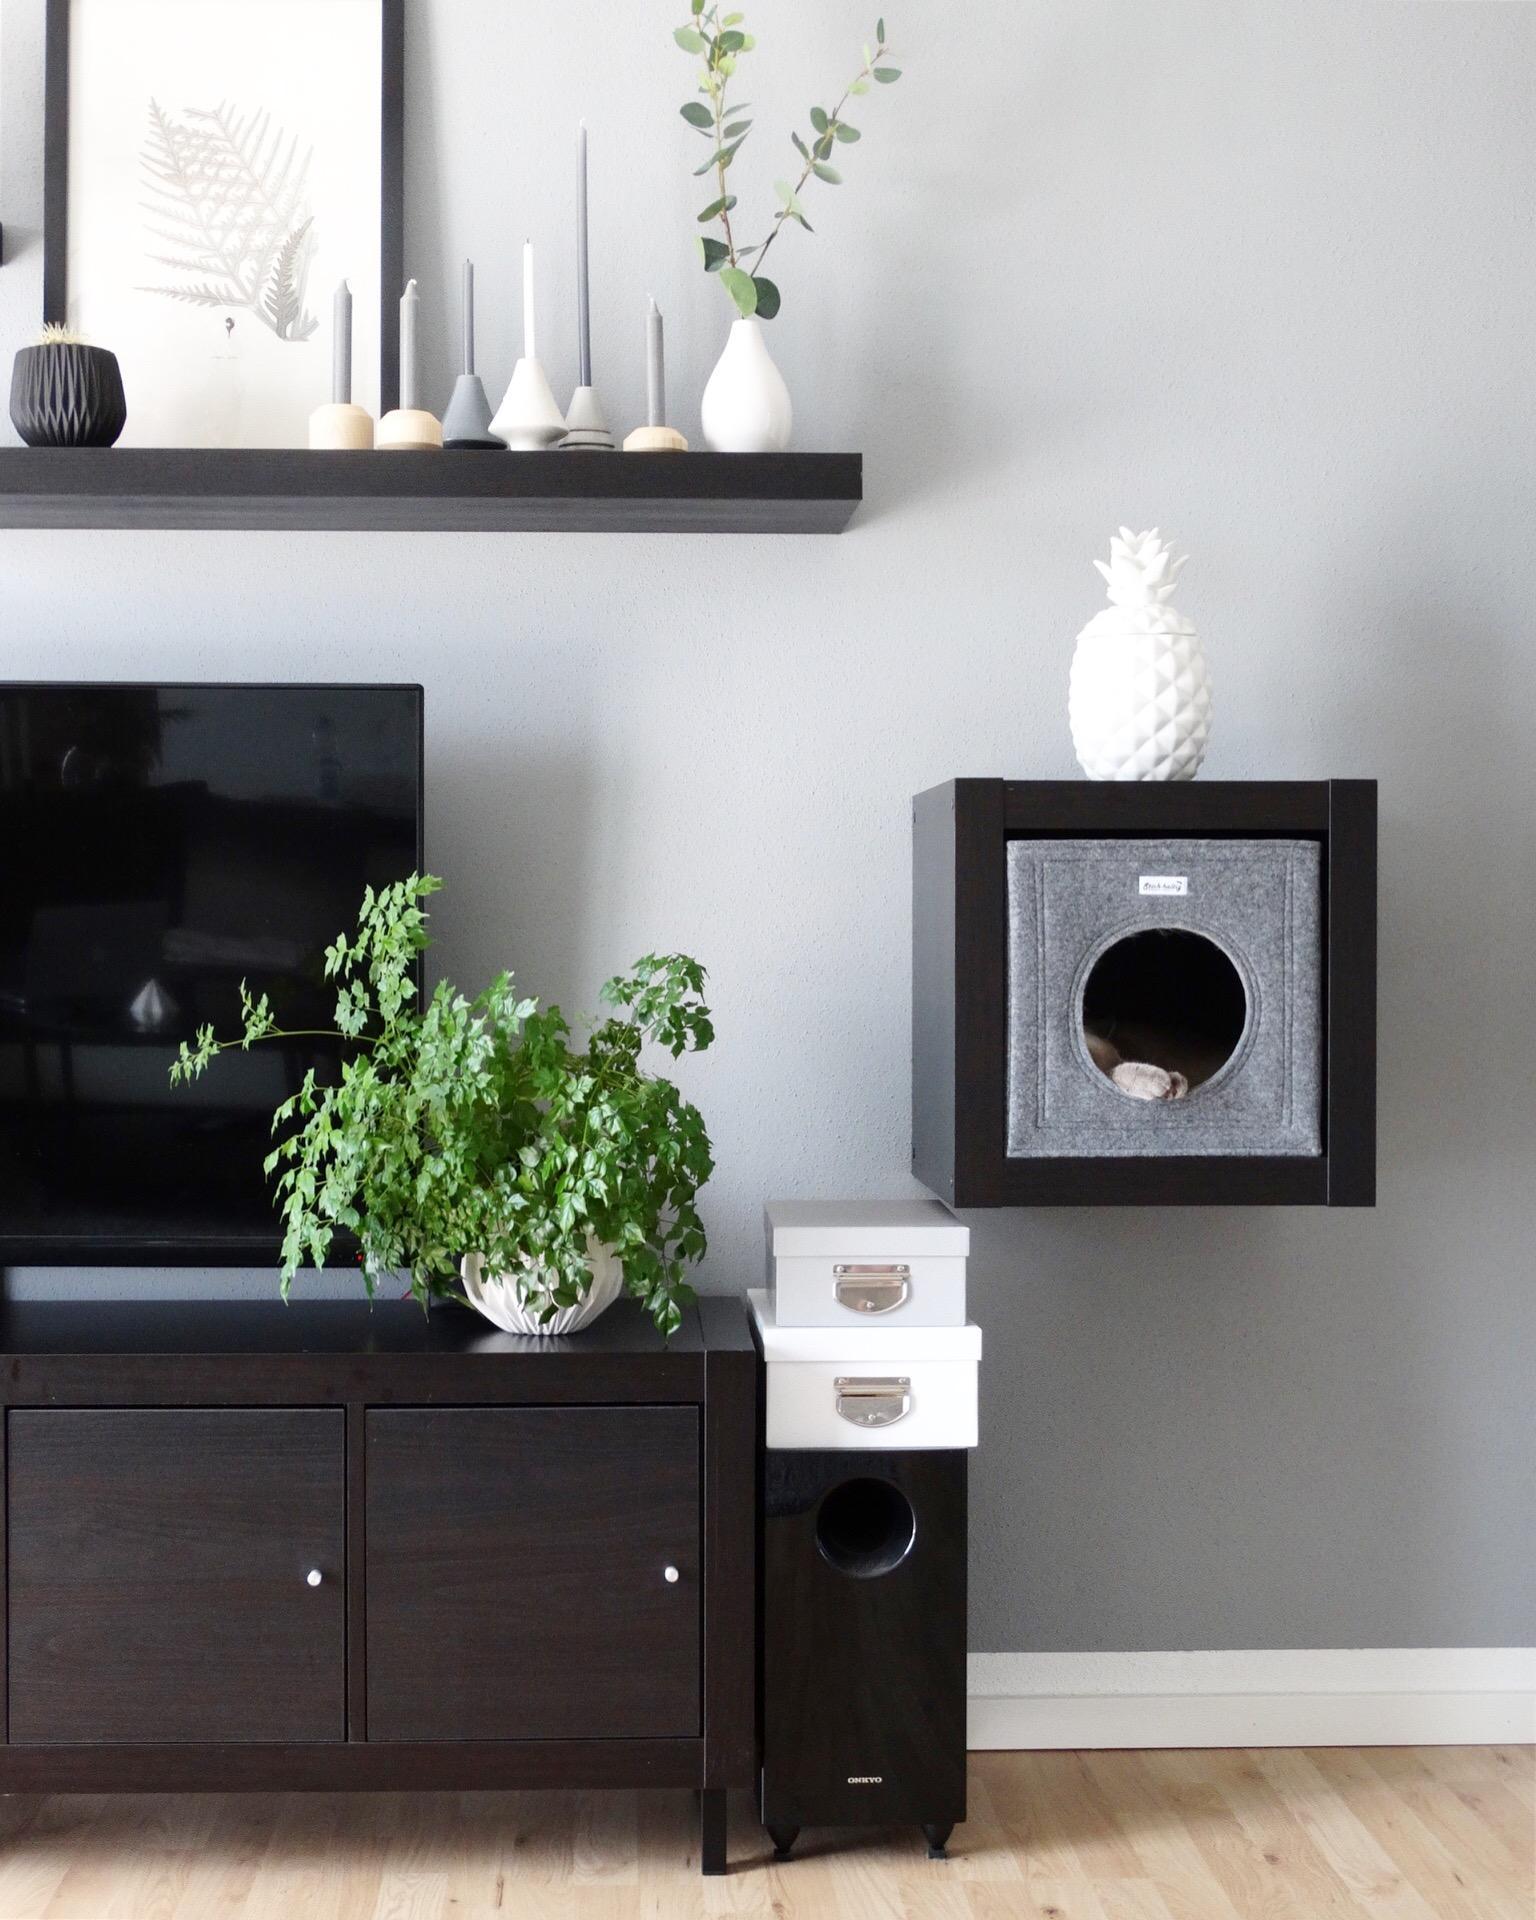 Ikea kallax bilder ideen couchstyle for Kallax ideen wohnzimmer